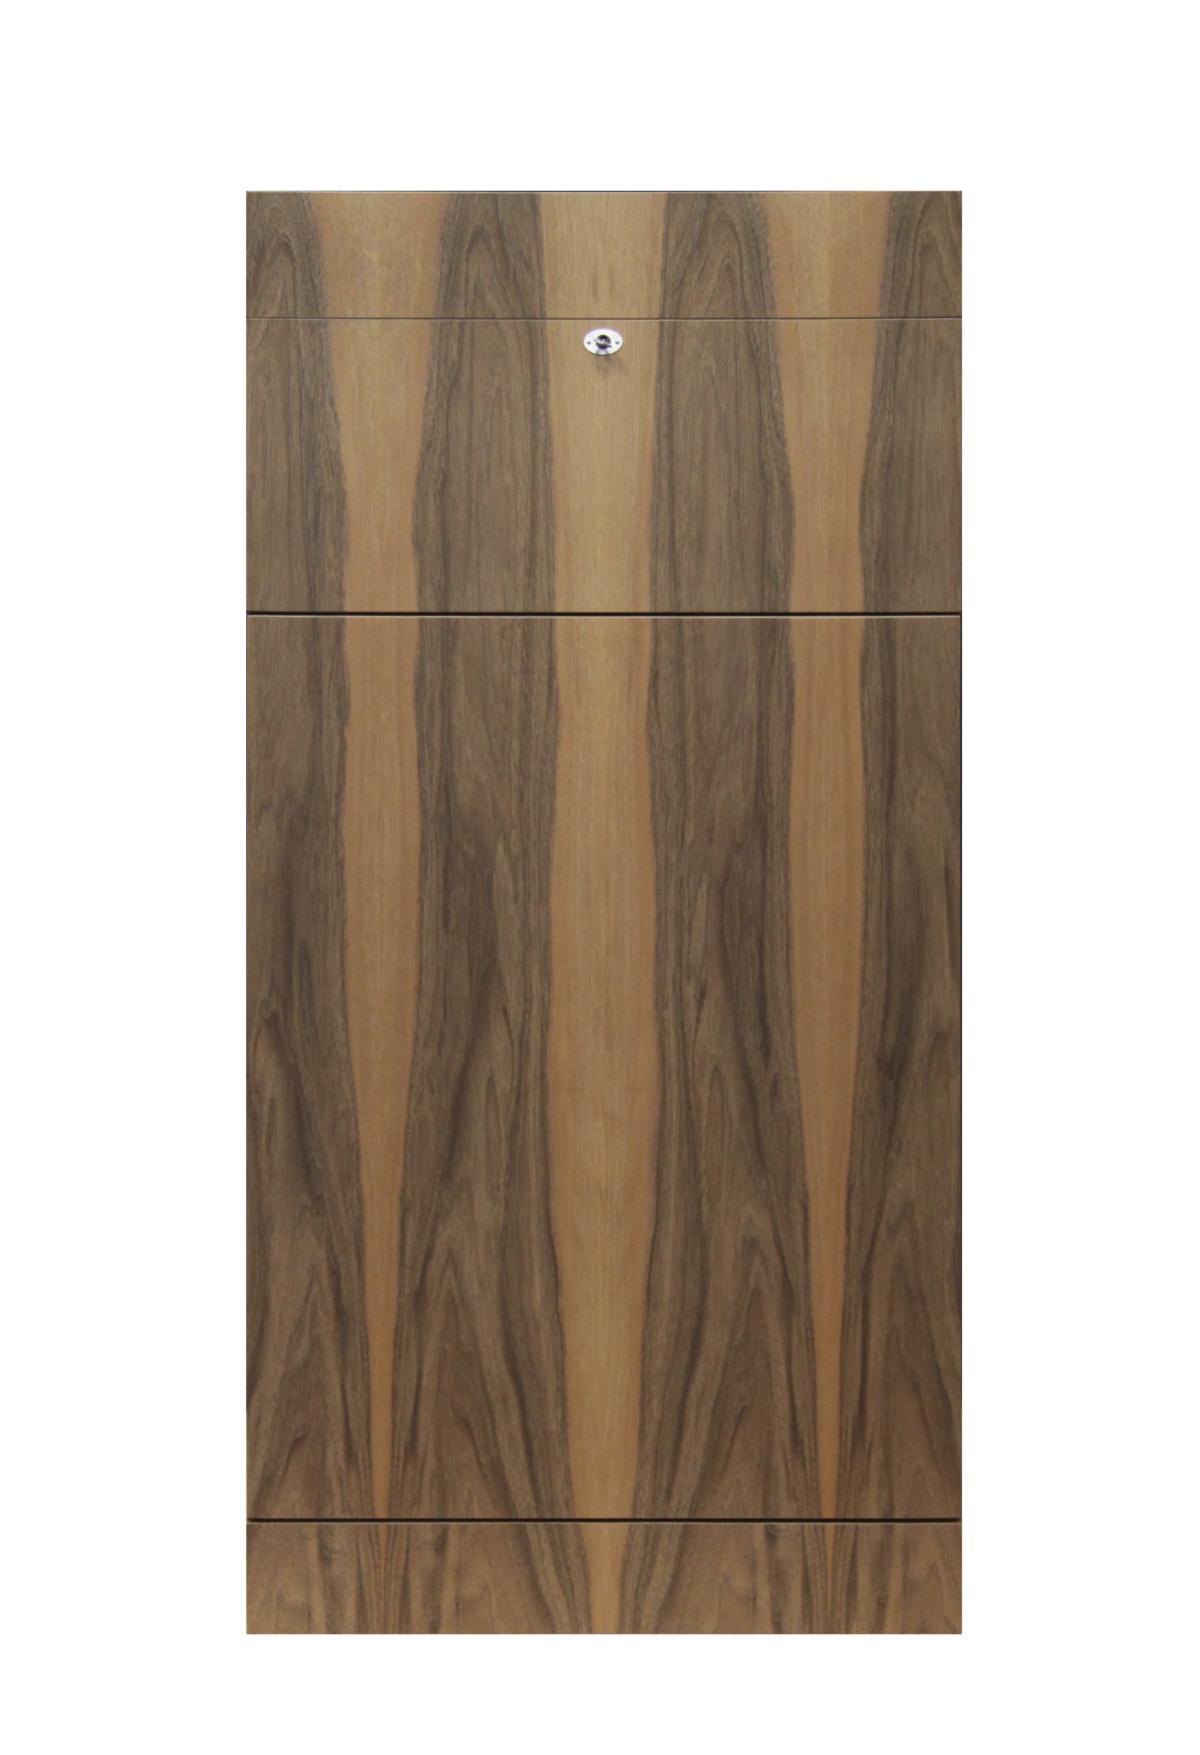 GERBER Humidore Monolith Nussbaum